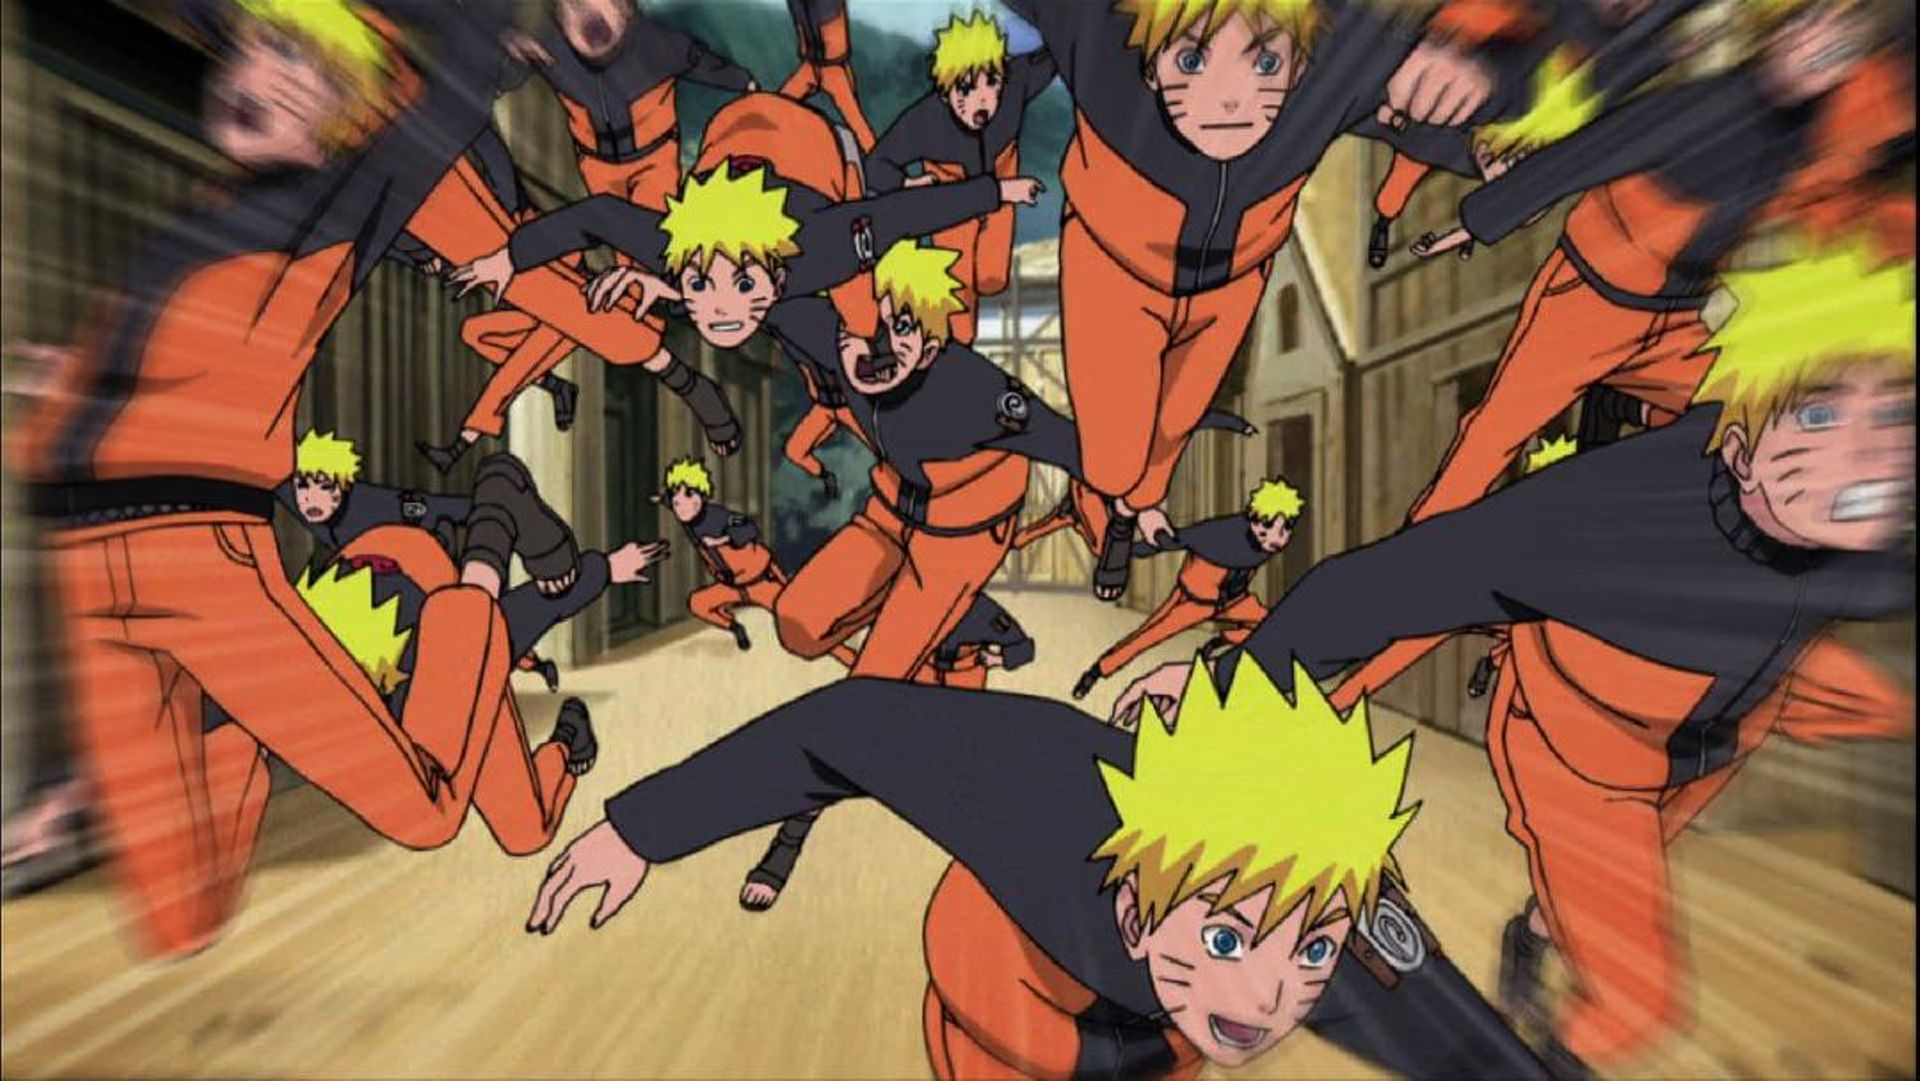 Naruto: Shippuden - The Girls Get-Together - Adult Swim